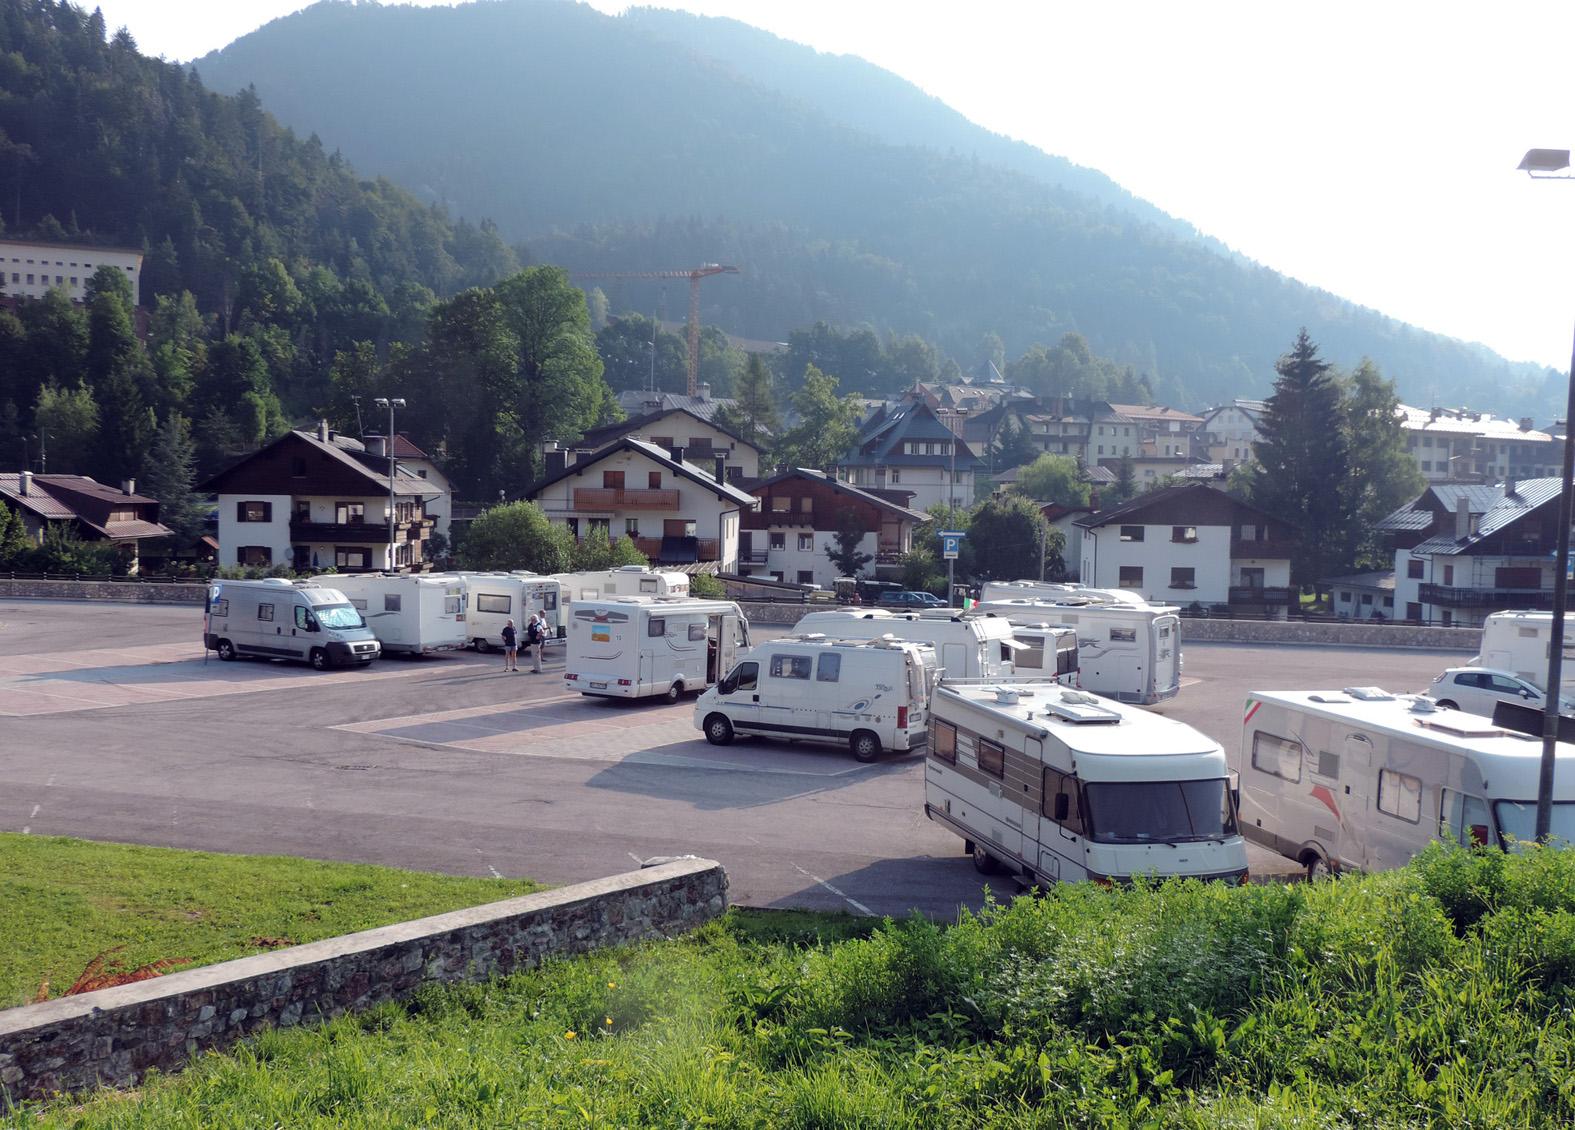 Italia - Tarvisio 20 luglio 2014